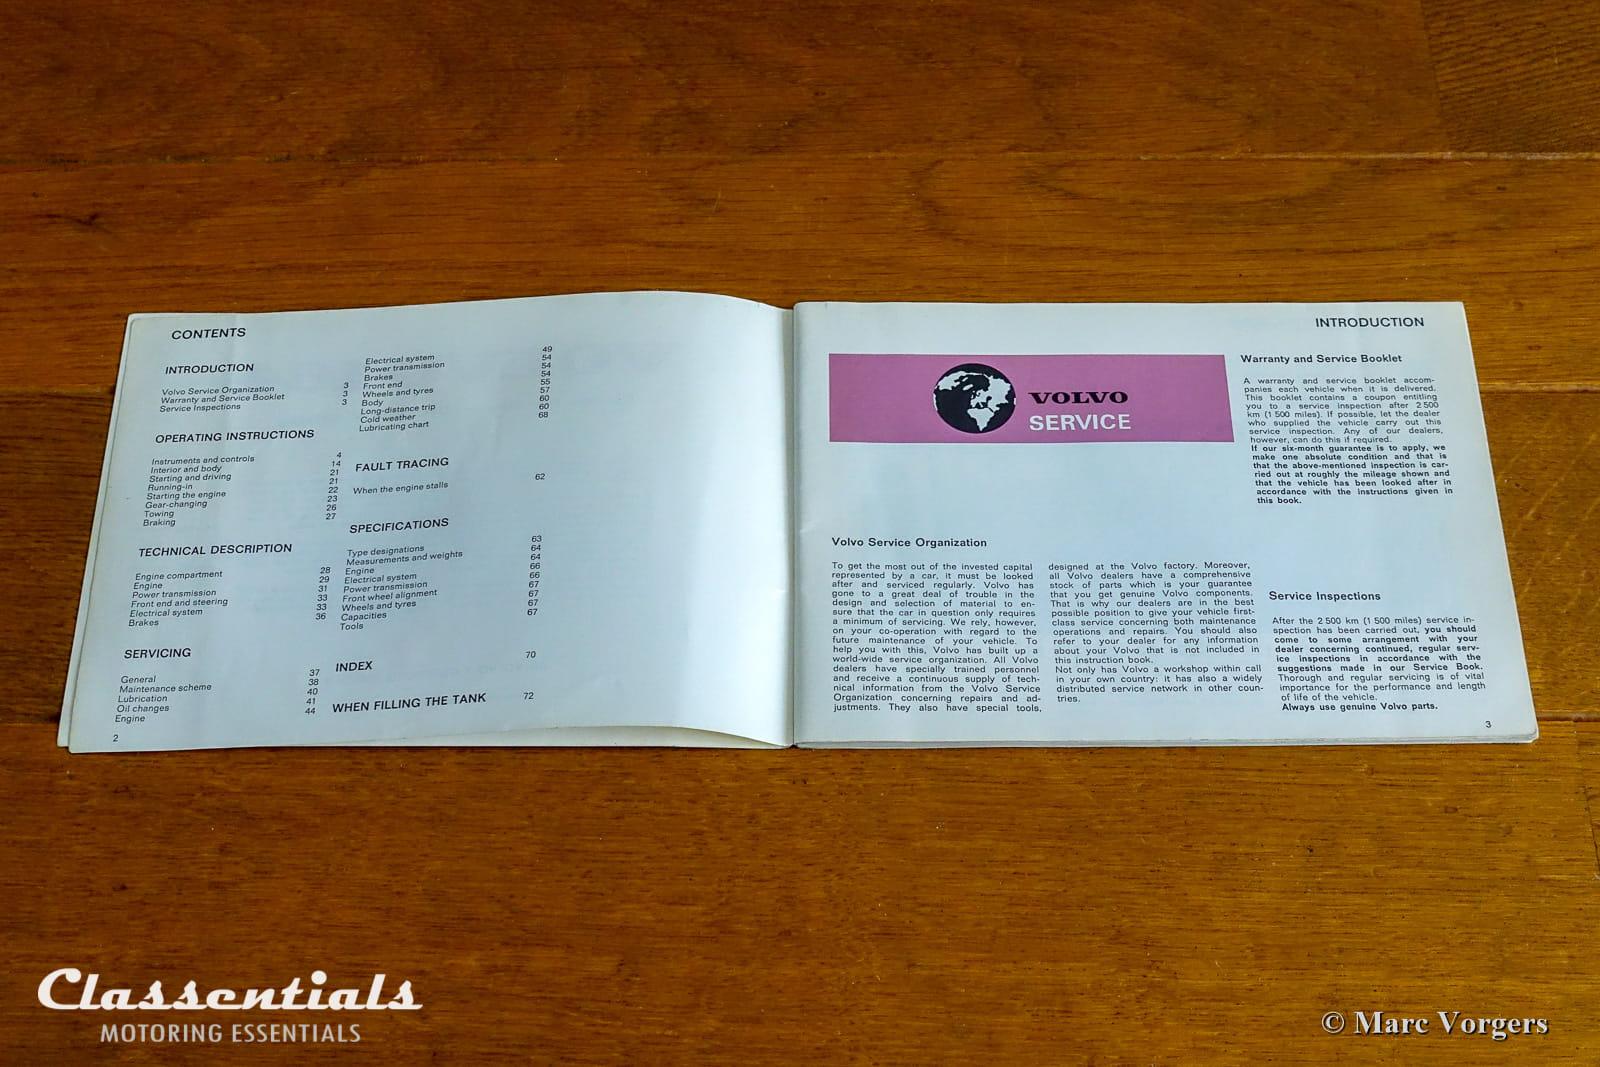 1969 1975 volvo 164 owner\u0027s manual tp 1054 1, 1973 classentials Ford Bronco Wiring Diagram 1969 1975 volvo 164 owner\u0027s manual tp 1054 1, 1973 english edition classentials